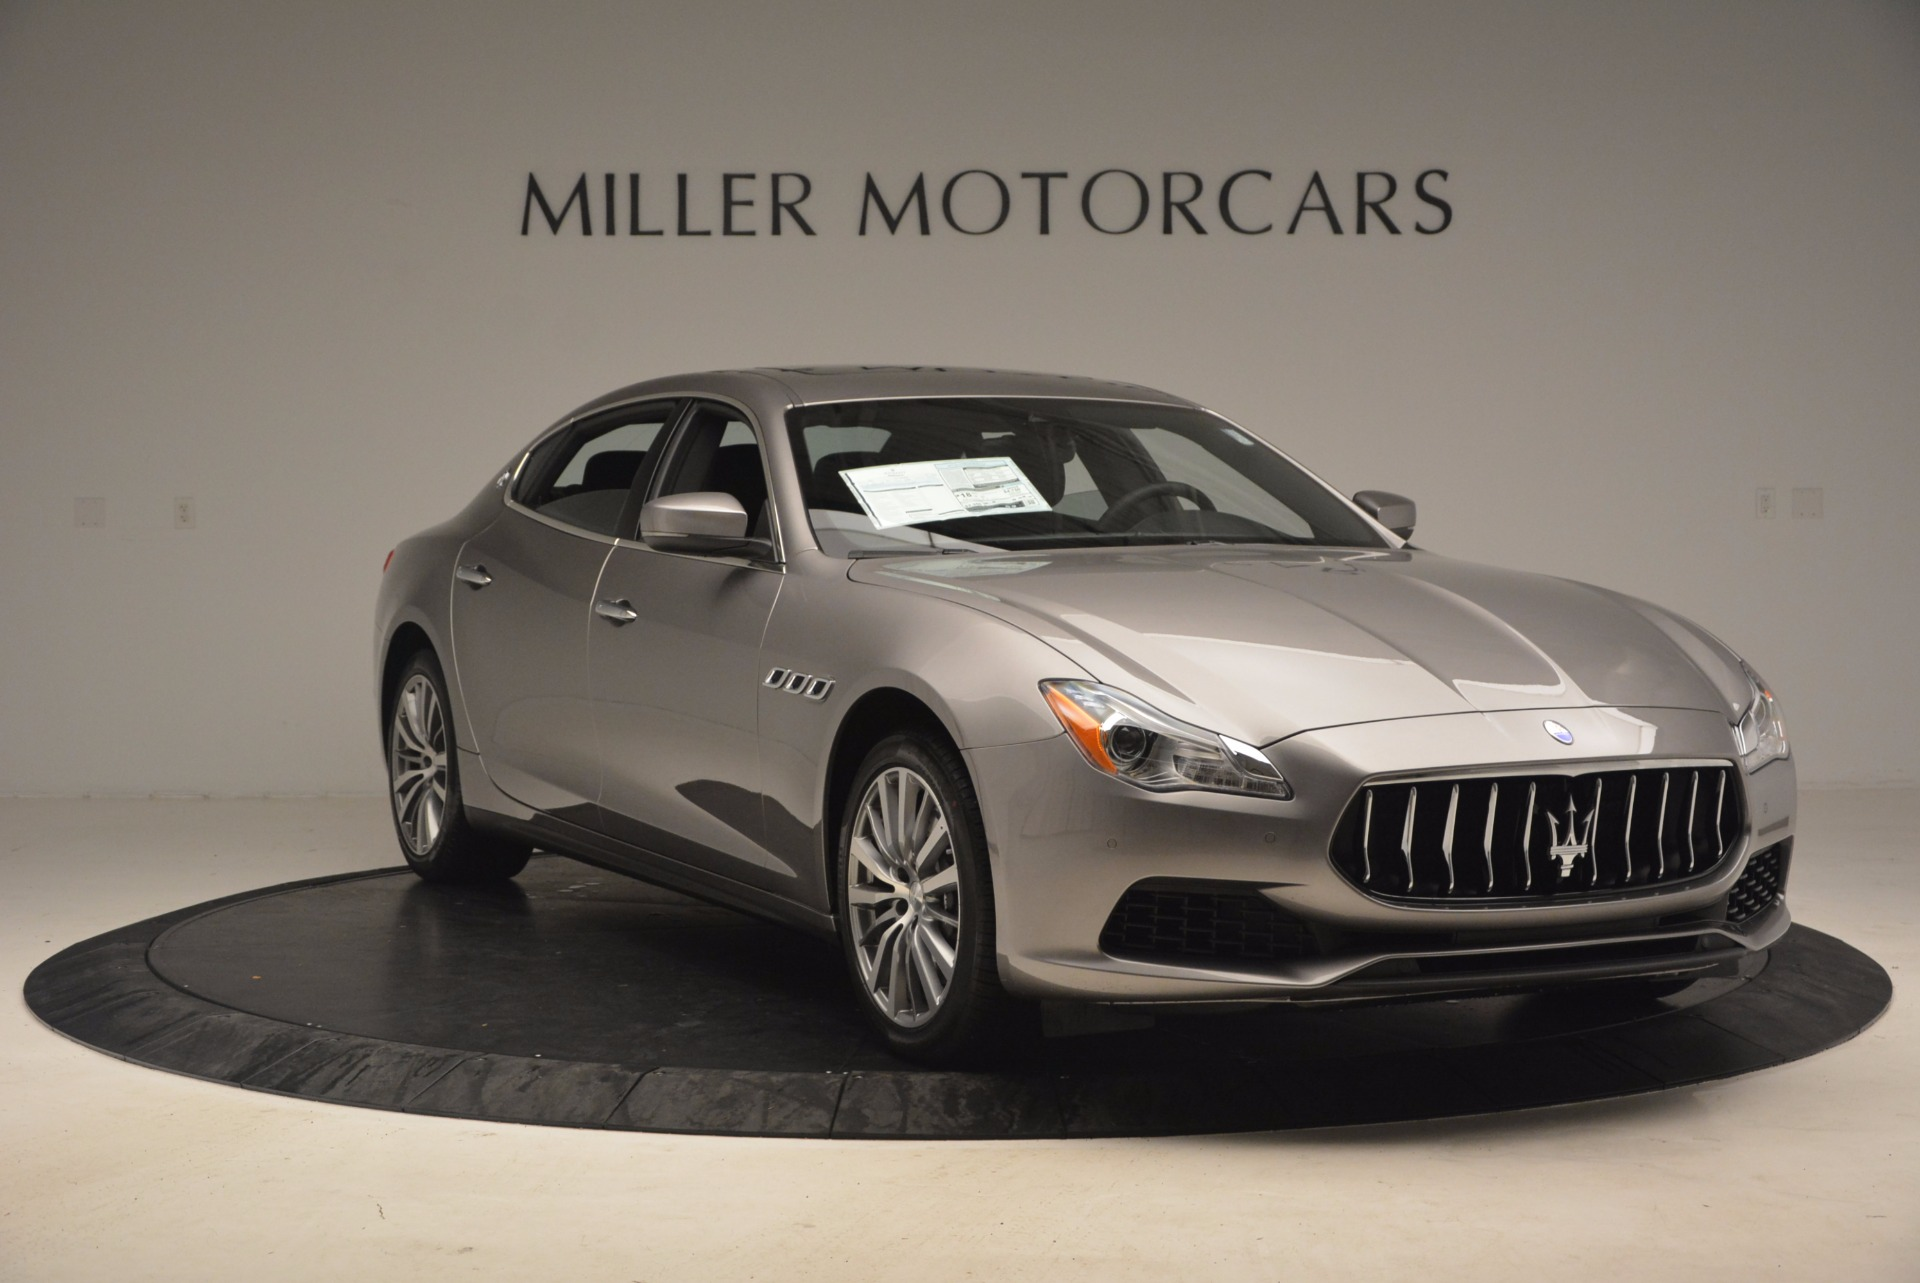 New 2017 Maserati Quattroporte SQ4 For Sale In Westport, CT 1066_p11